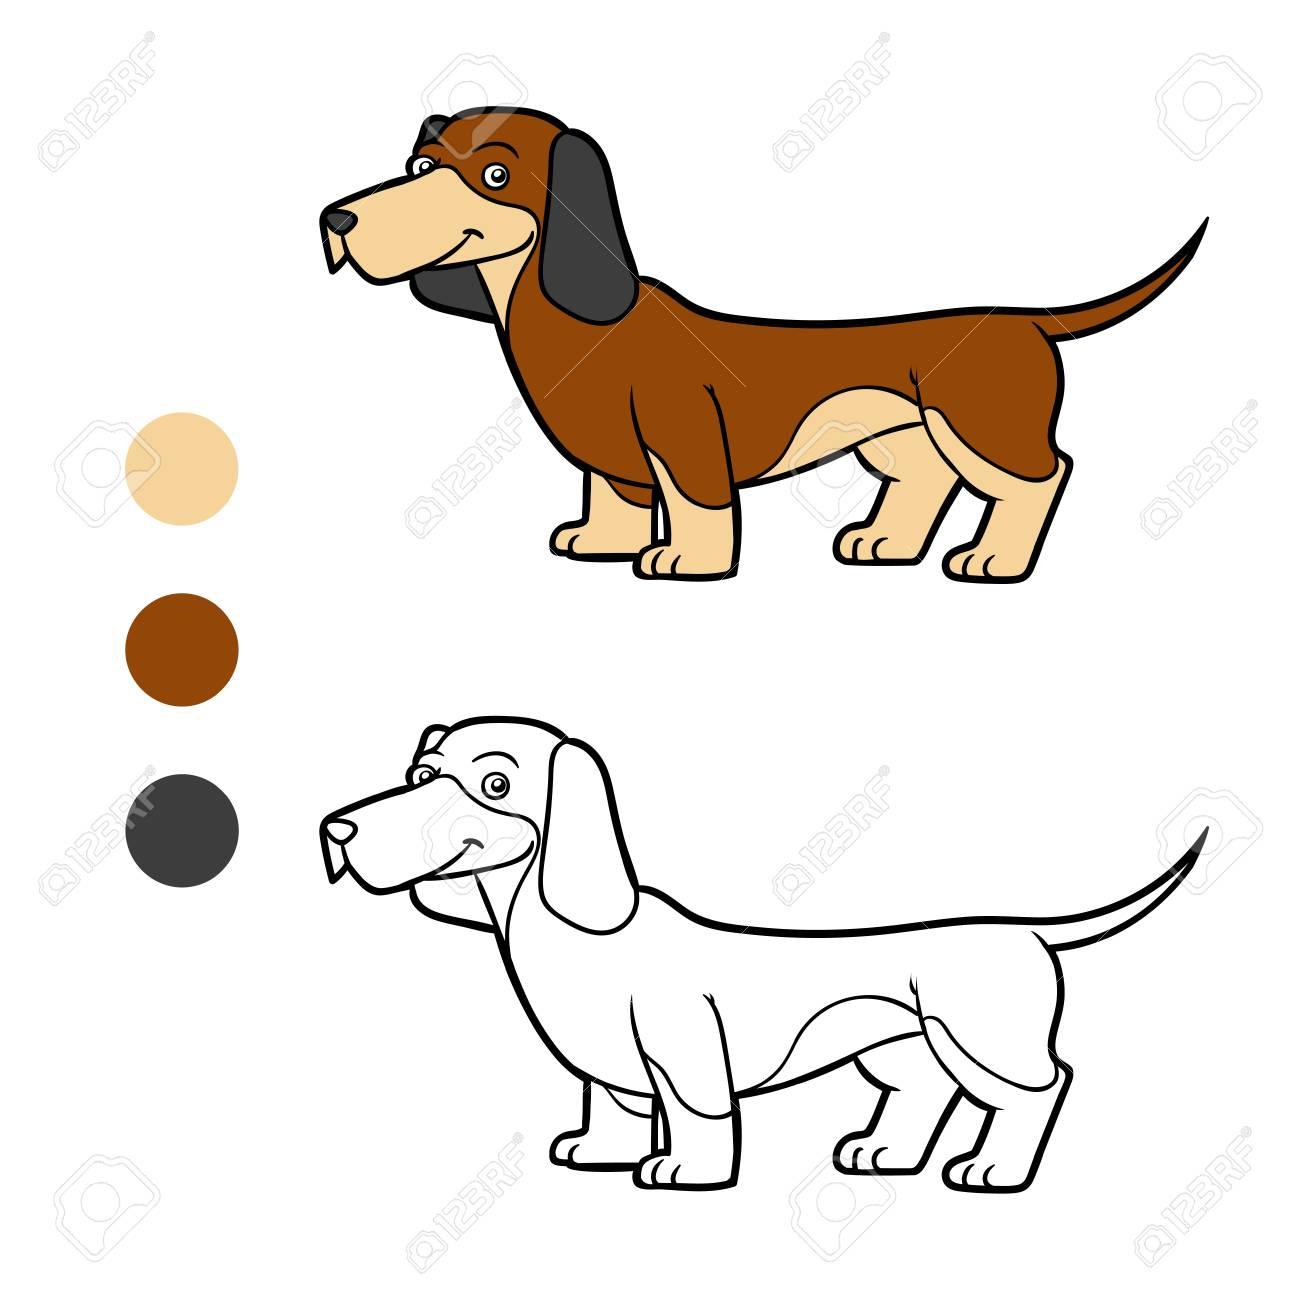 Libro De Colorear Para Niños, Razas De Perros: Dachshund ...